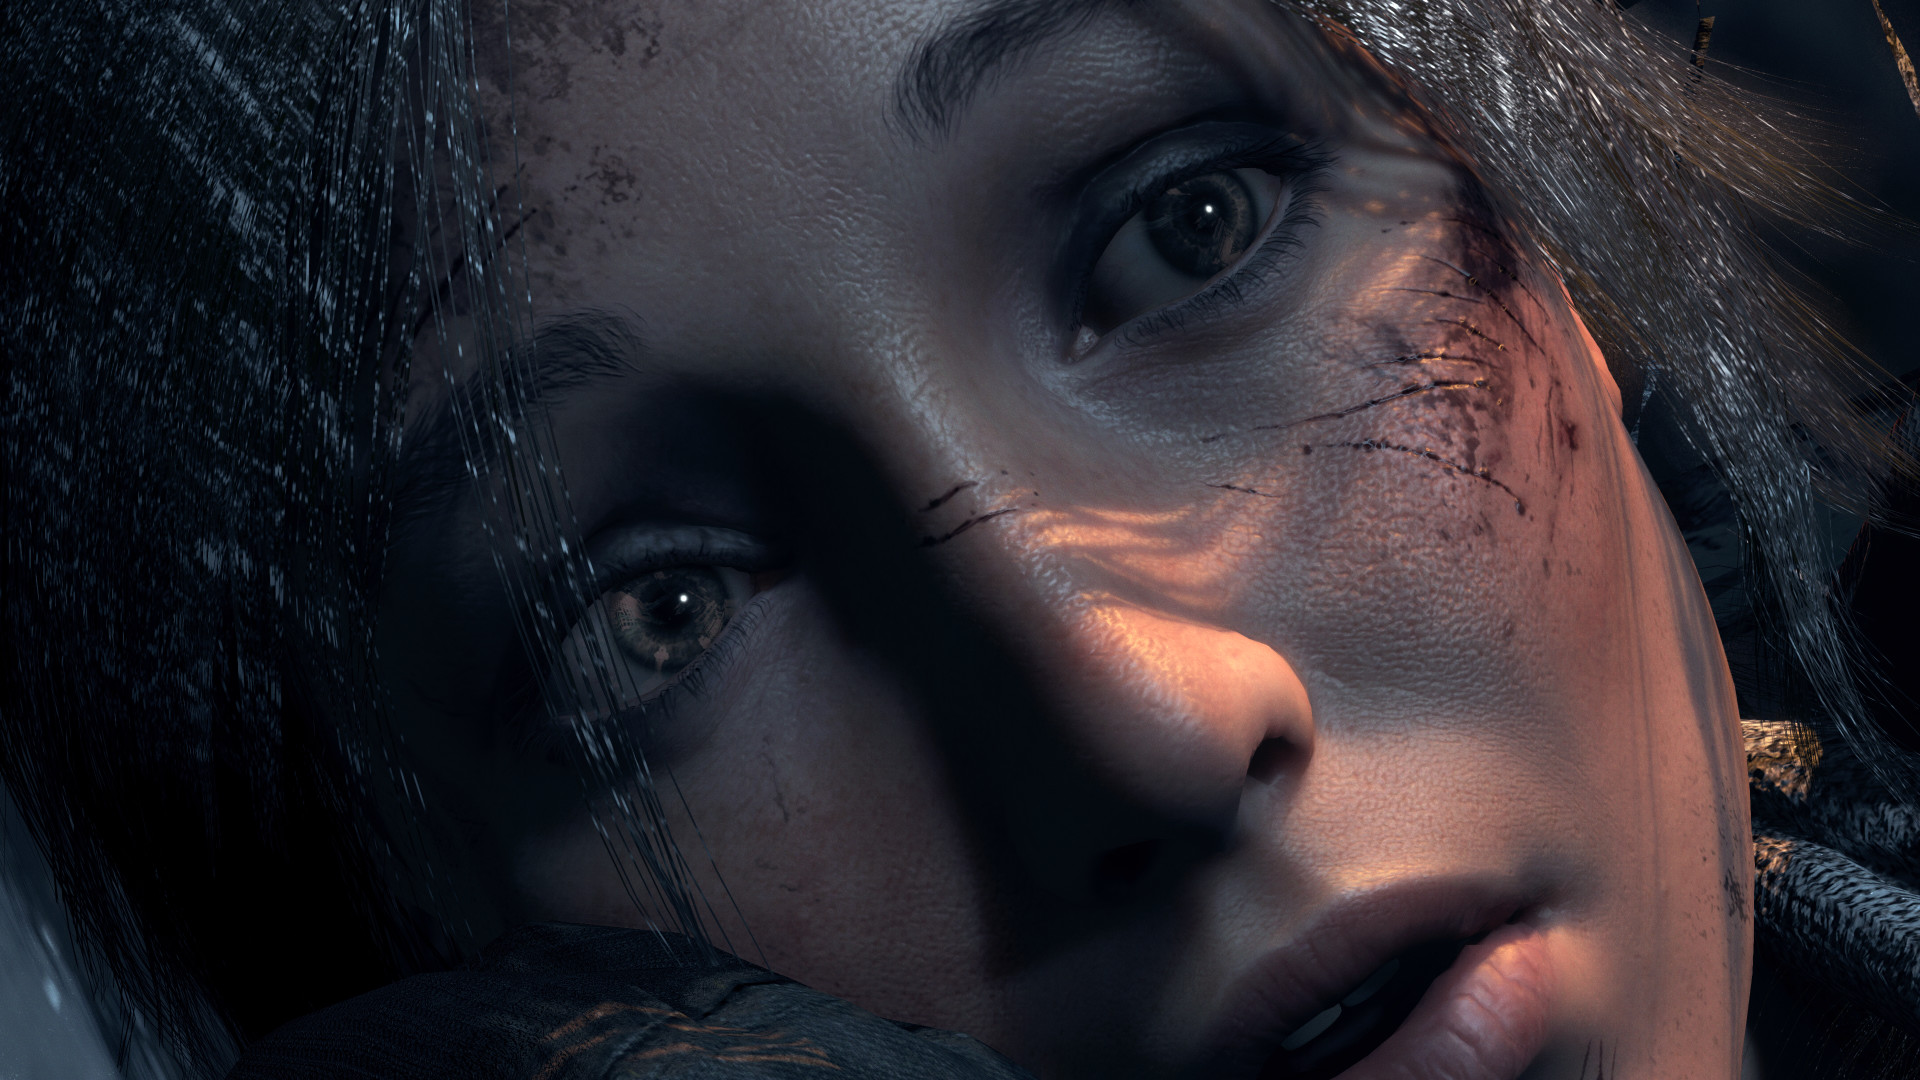 Rise Of The Tomb Raider ESPAÑOL Descargar Full (CPY) + REPACK 5 DVD5 (JPW) 3